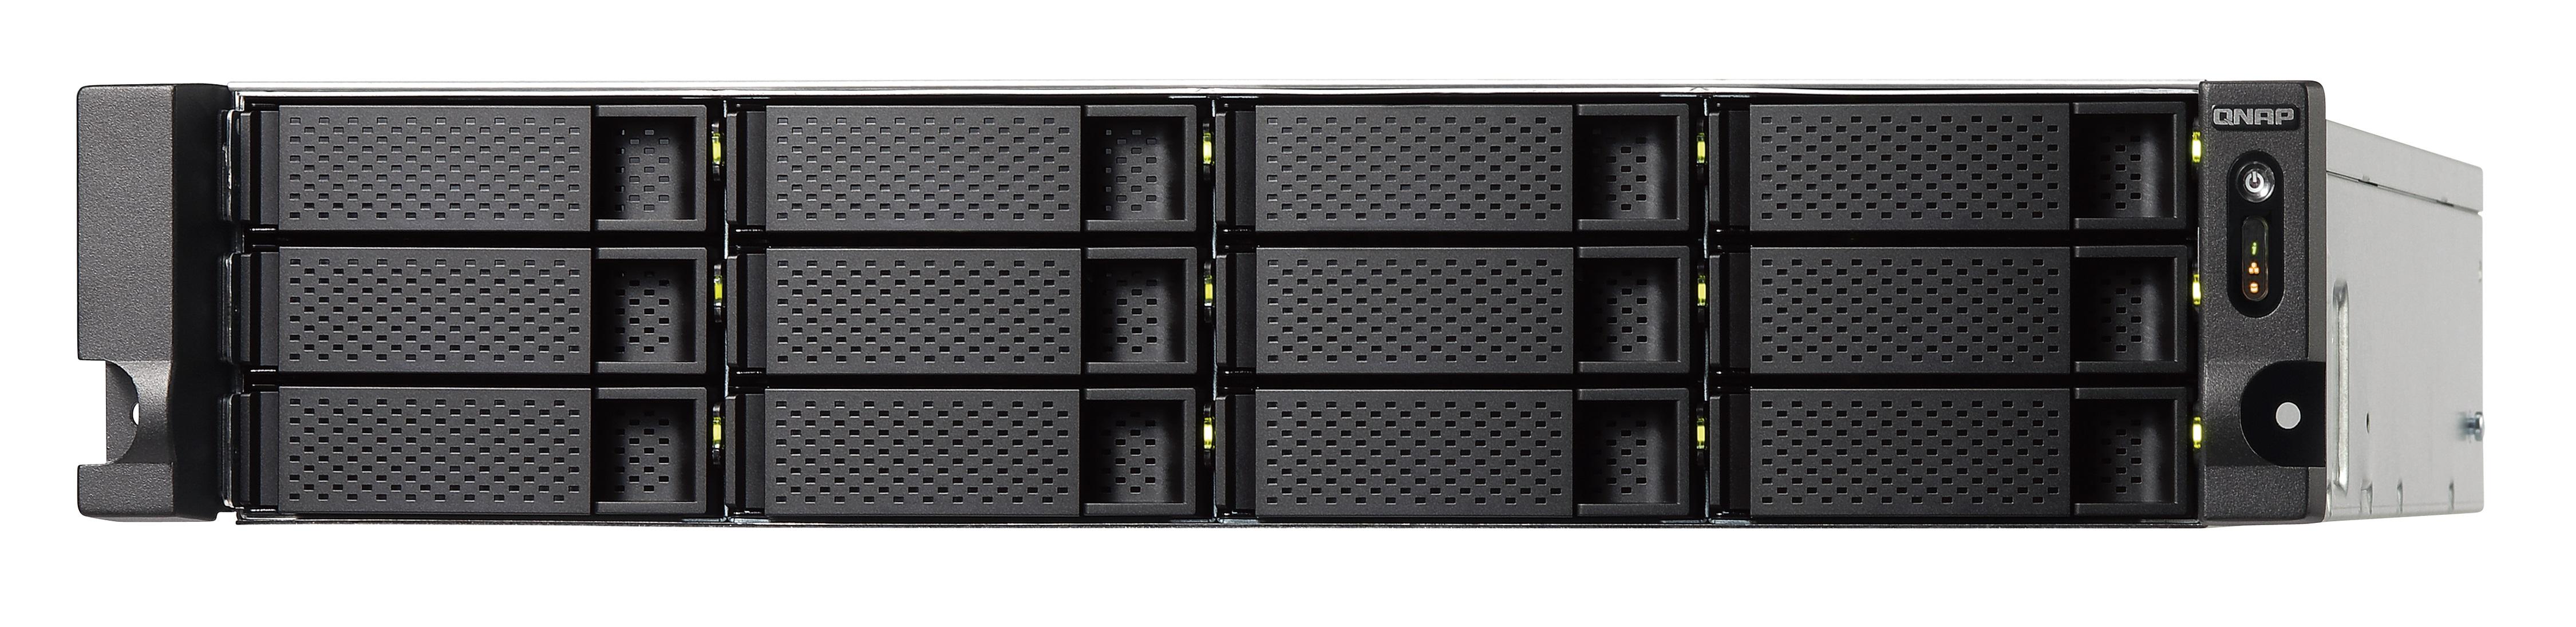 QNAP TS-1231XU (1,7GHz/4GB RAM/12xSATA/10GbE SFP+)